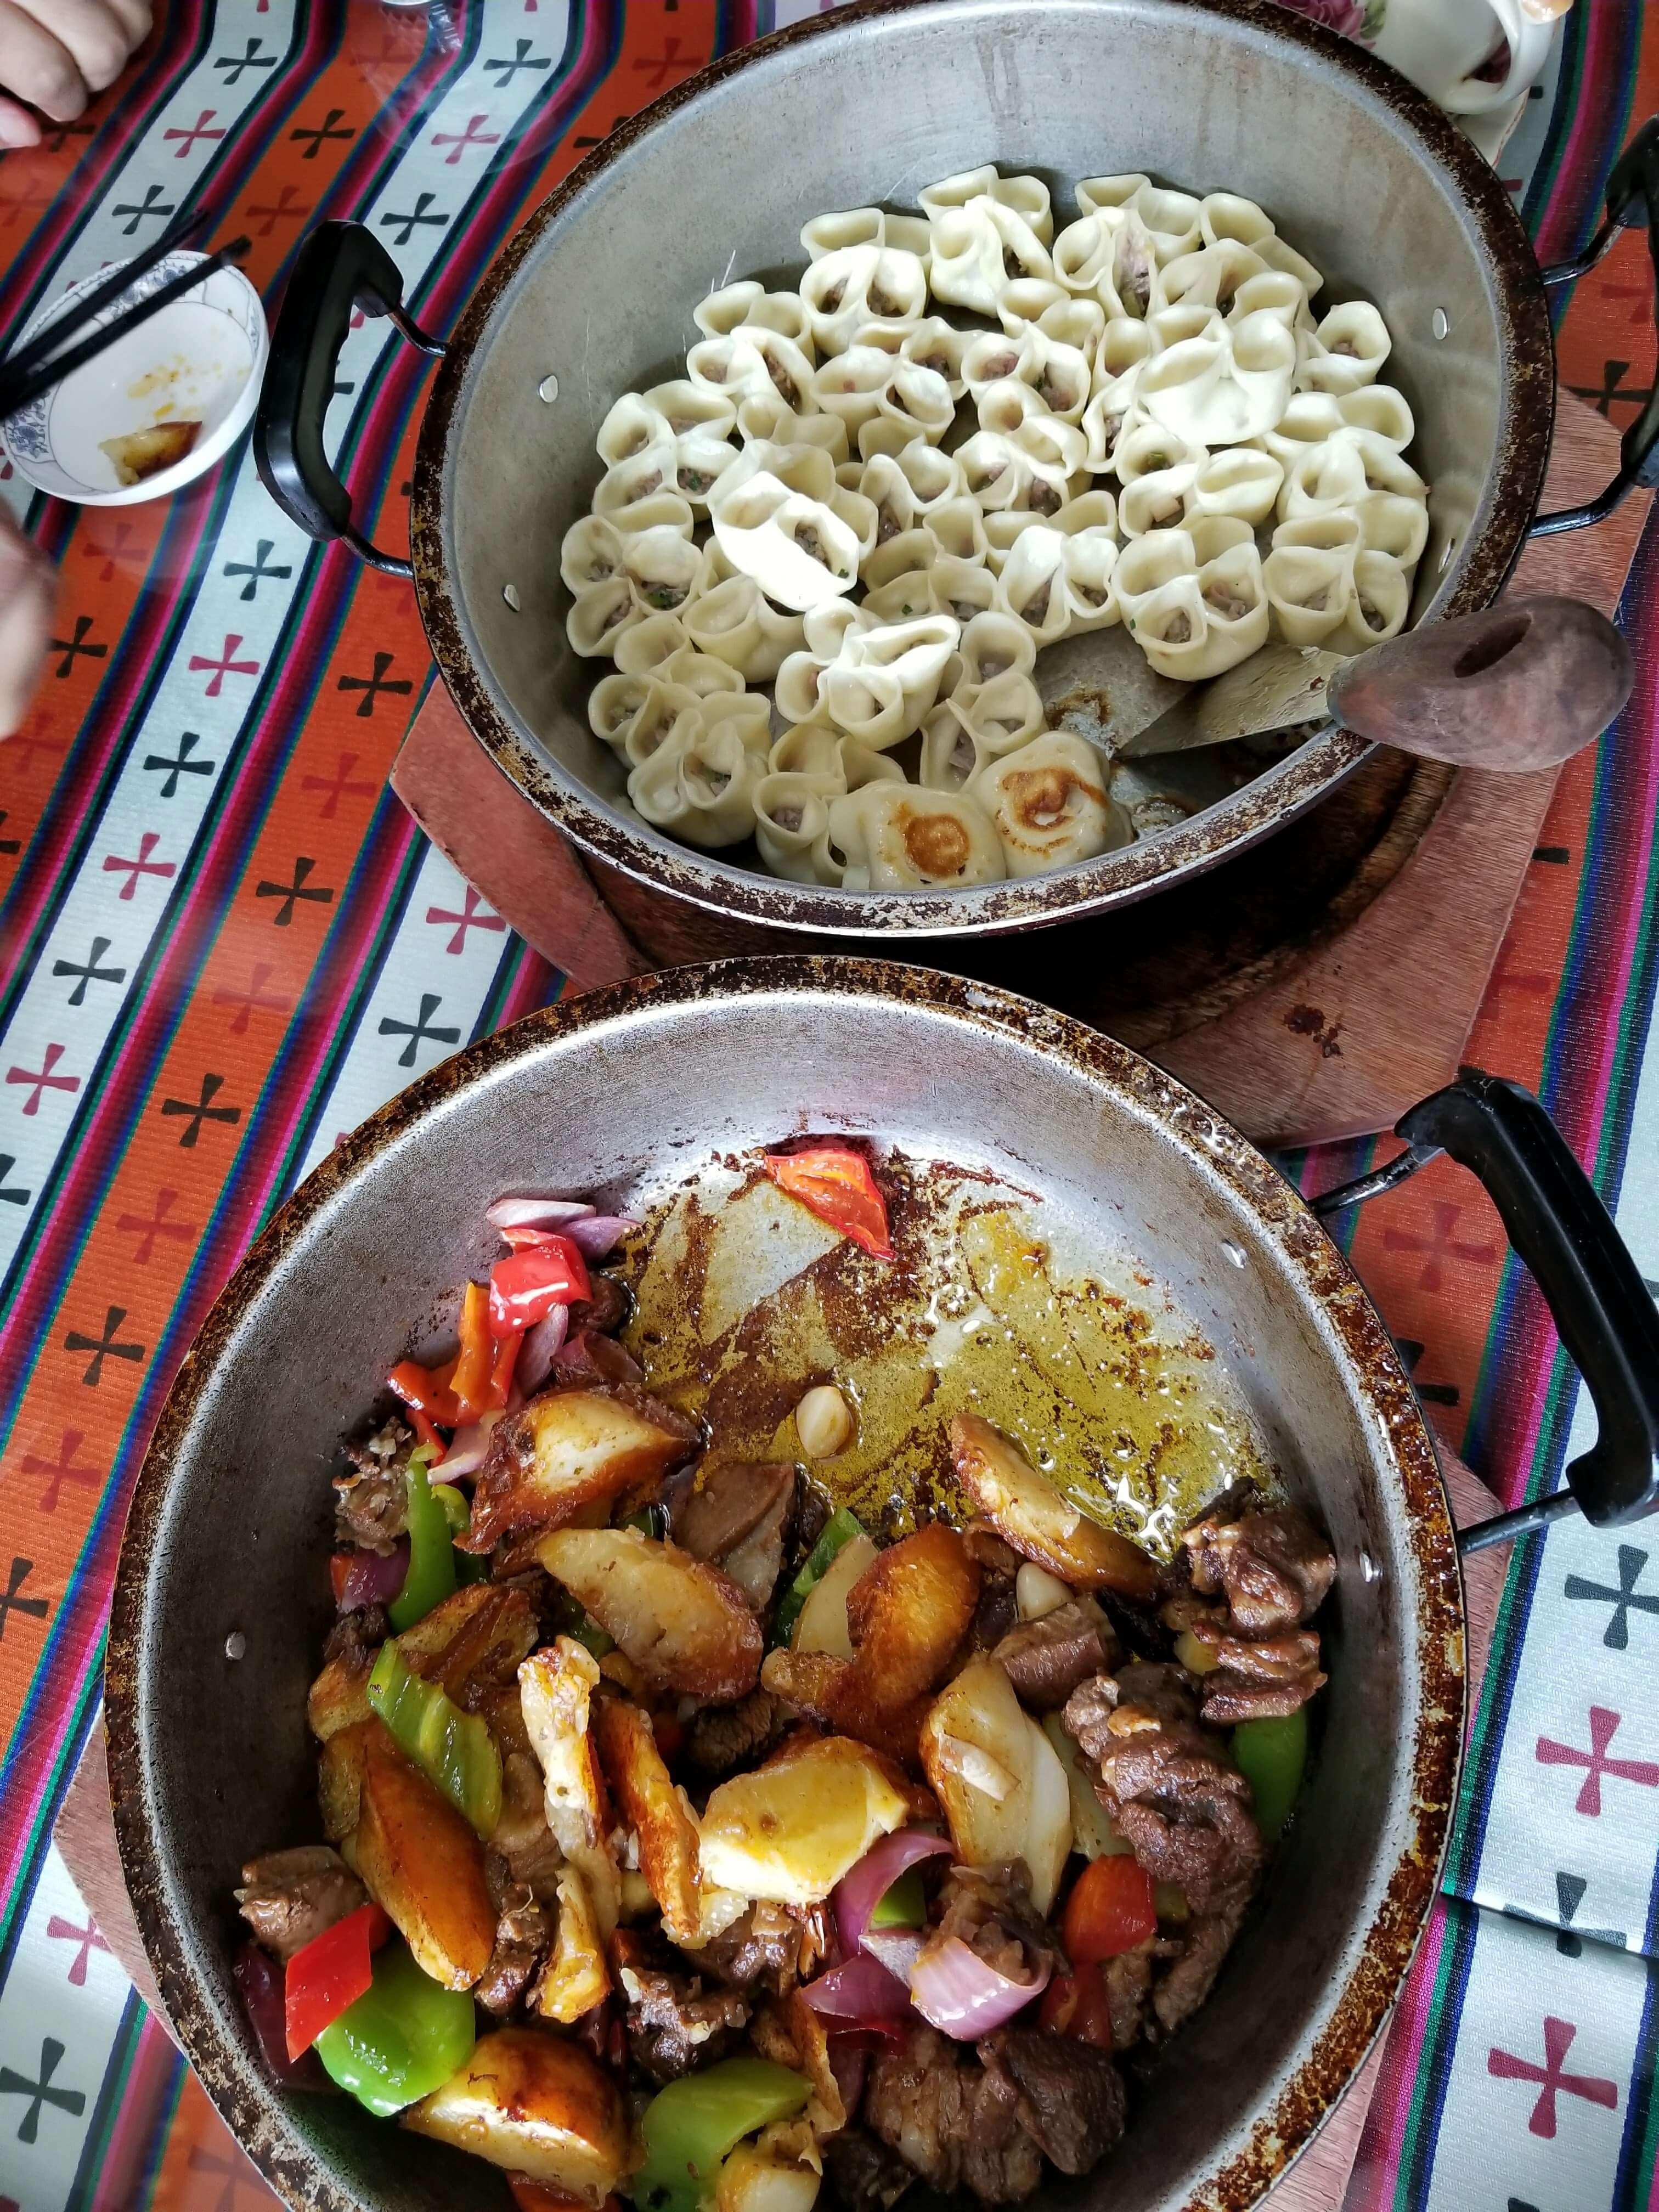 Tibetan dumplings yak stir fry